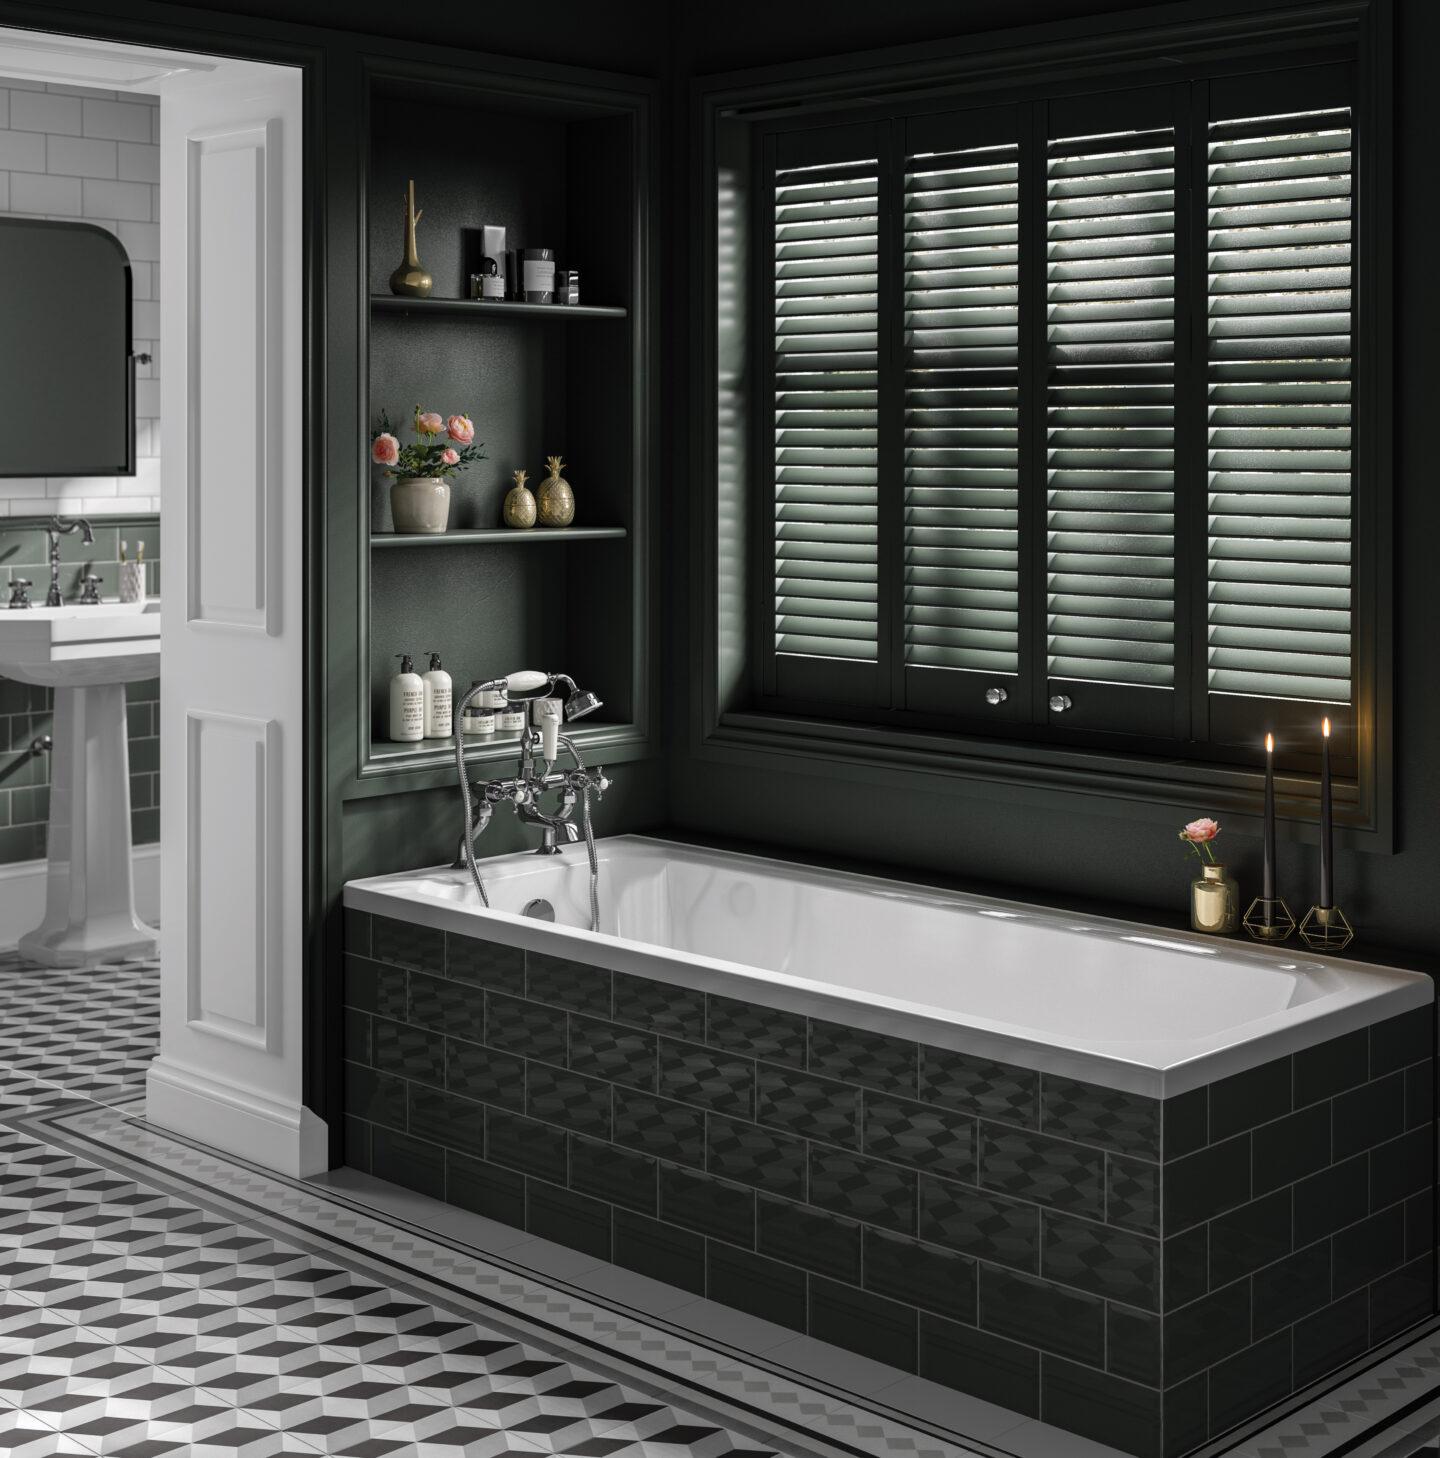 Trojan's Art Deco Single Ended Bath Roomset